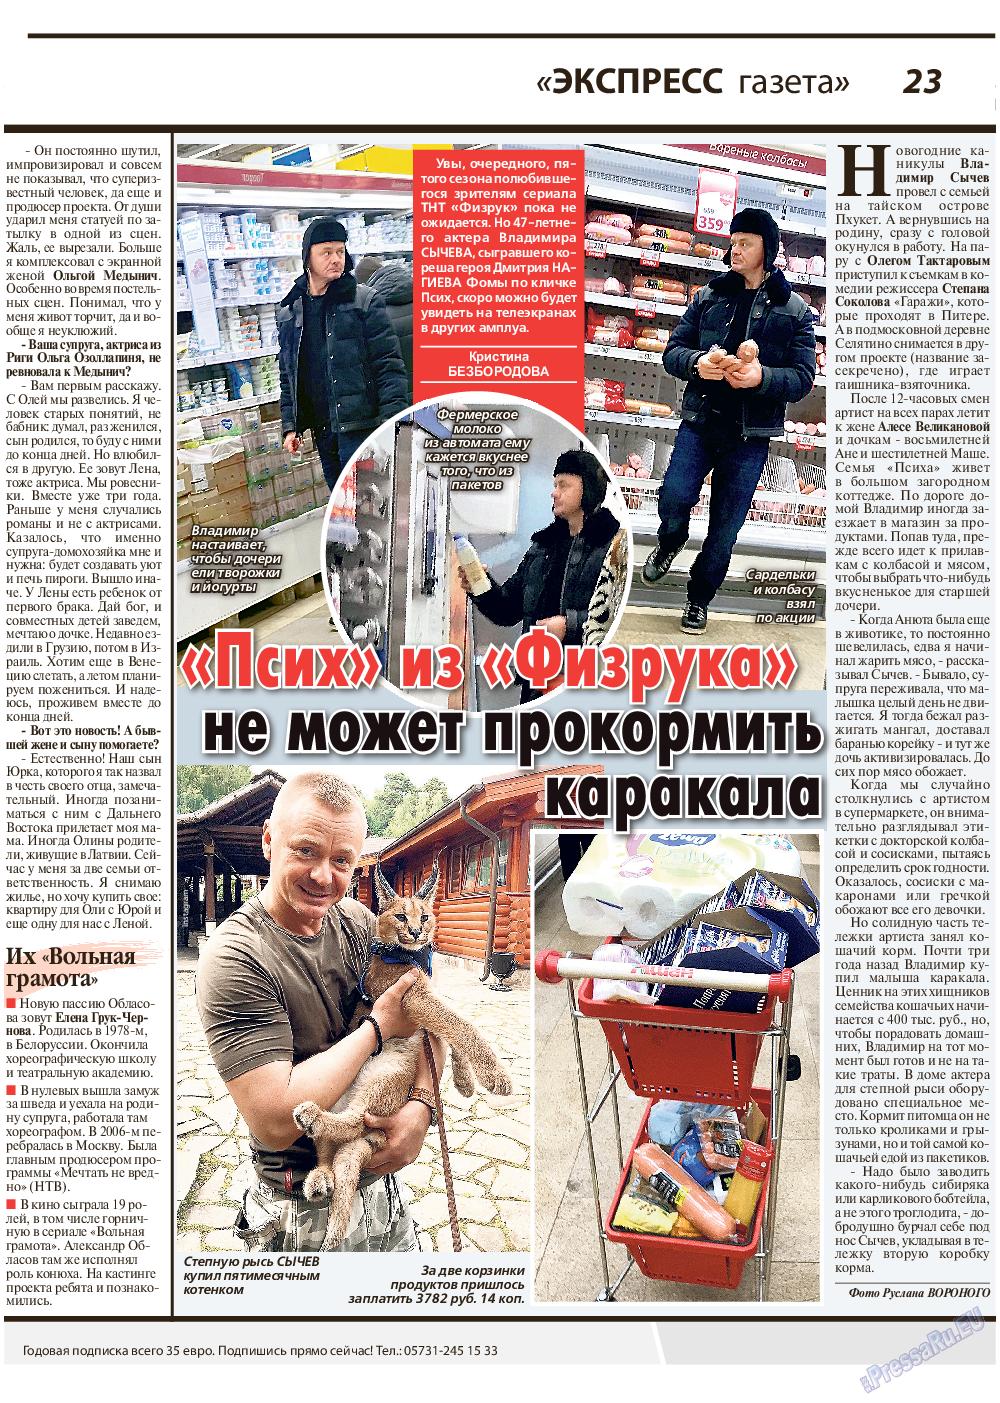 Экспресс газета (газета). 2019 год, номер 3, стр. 23